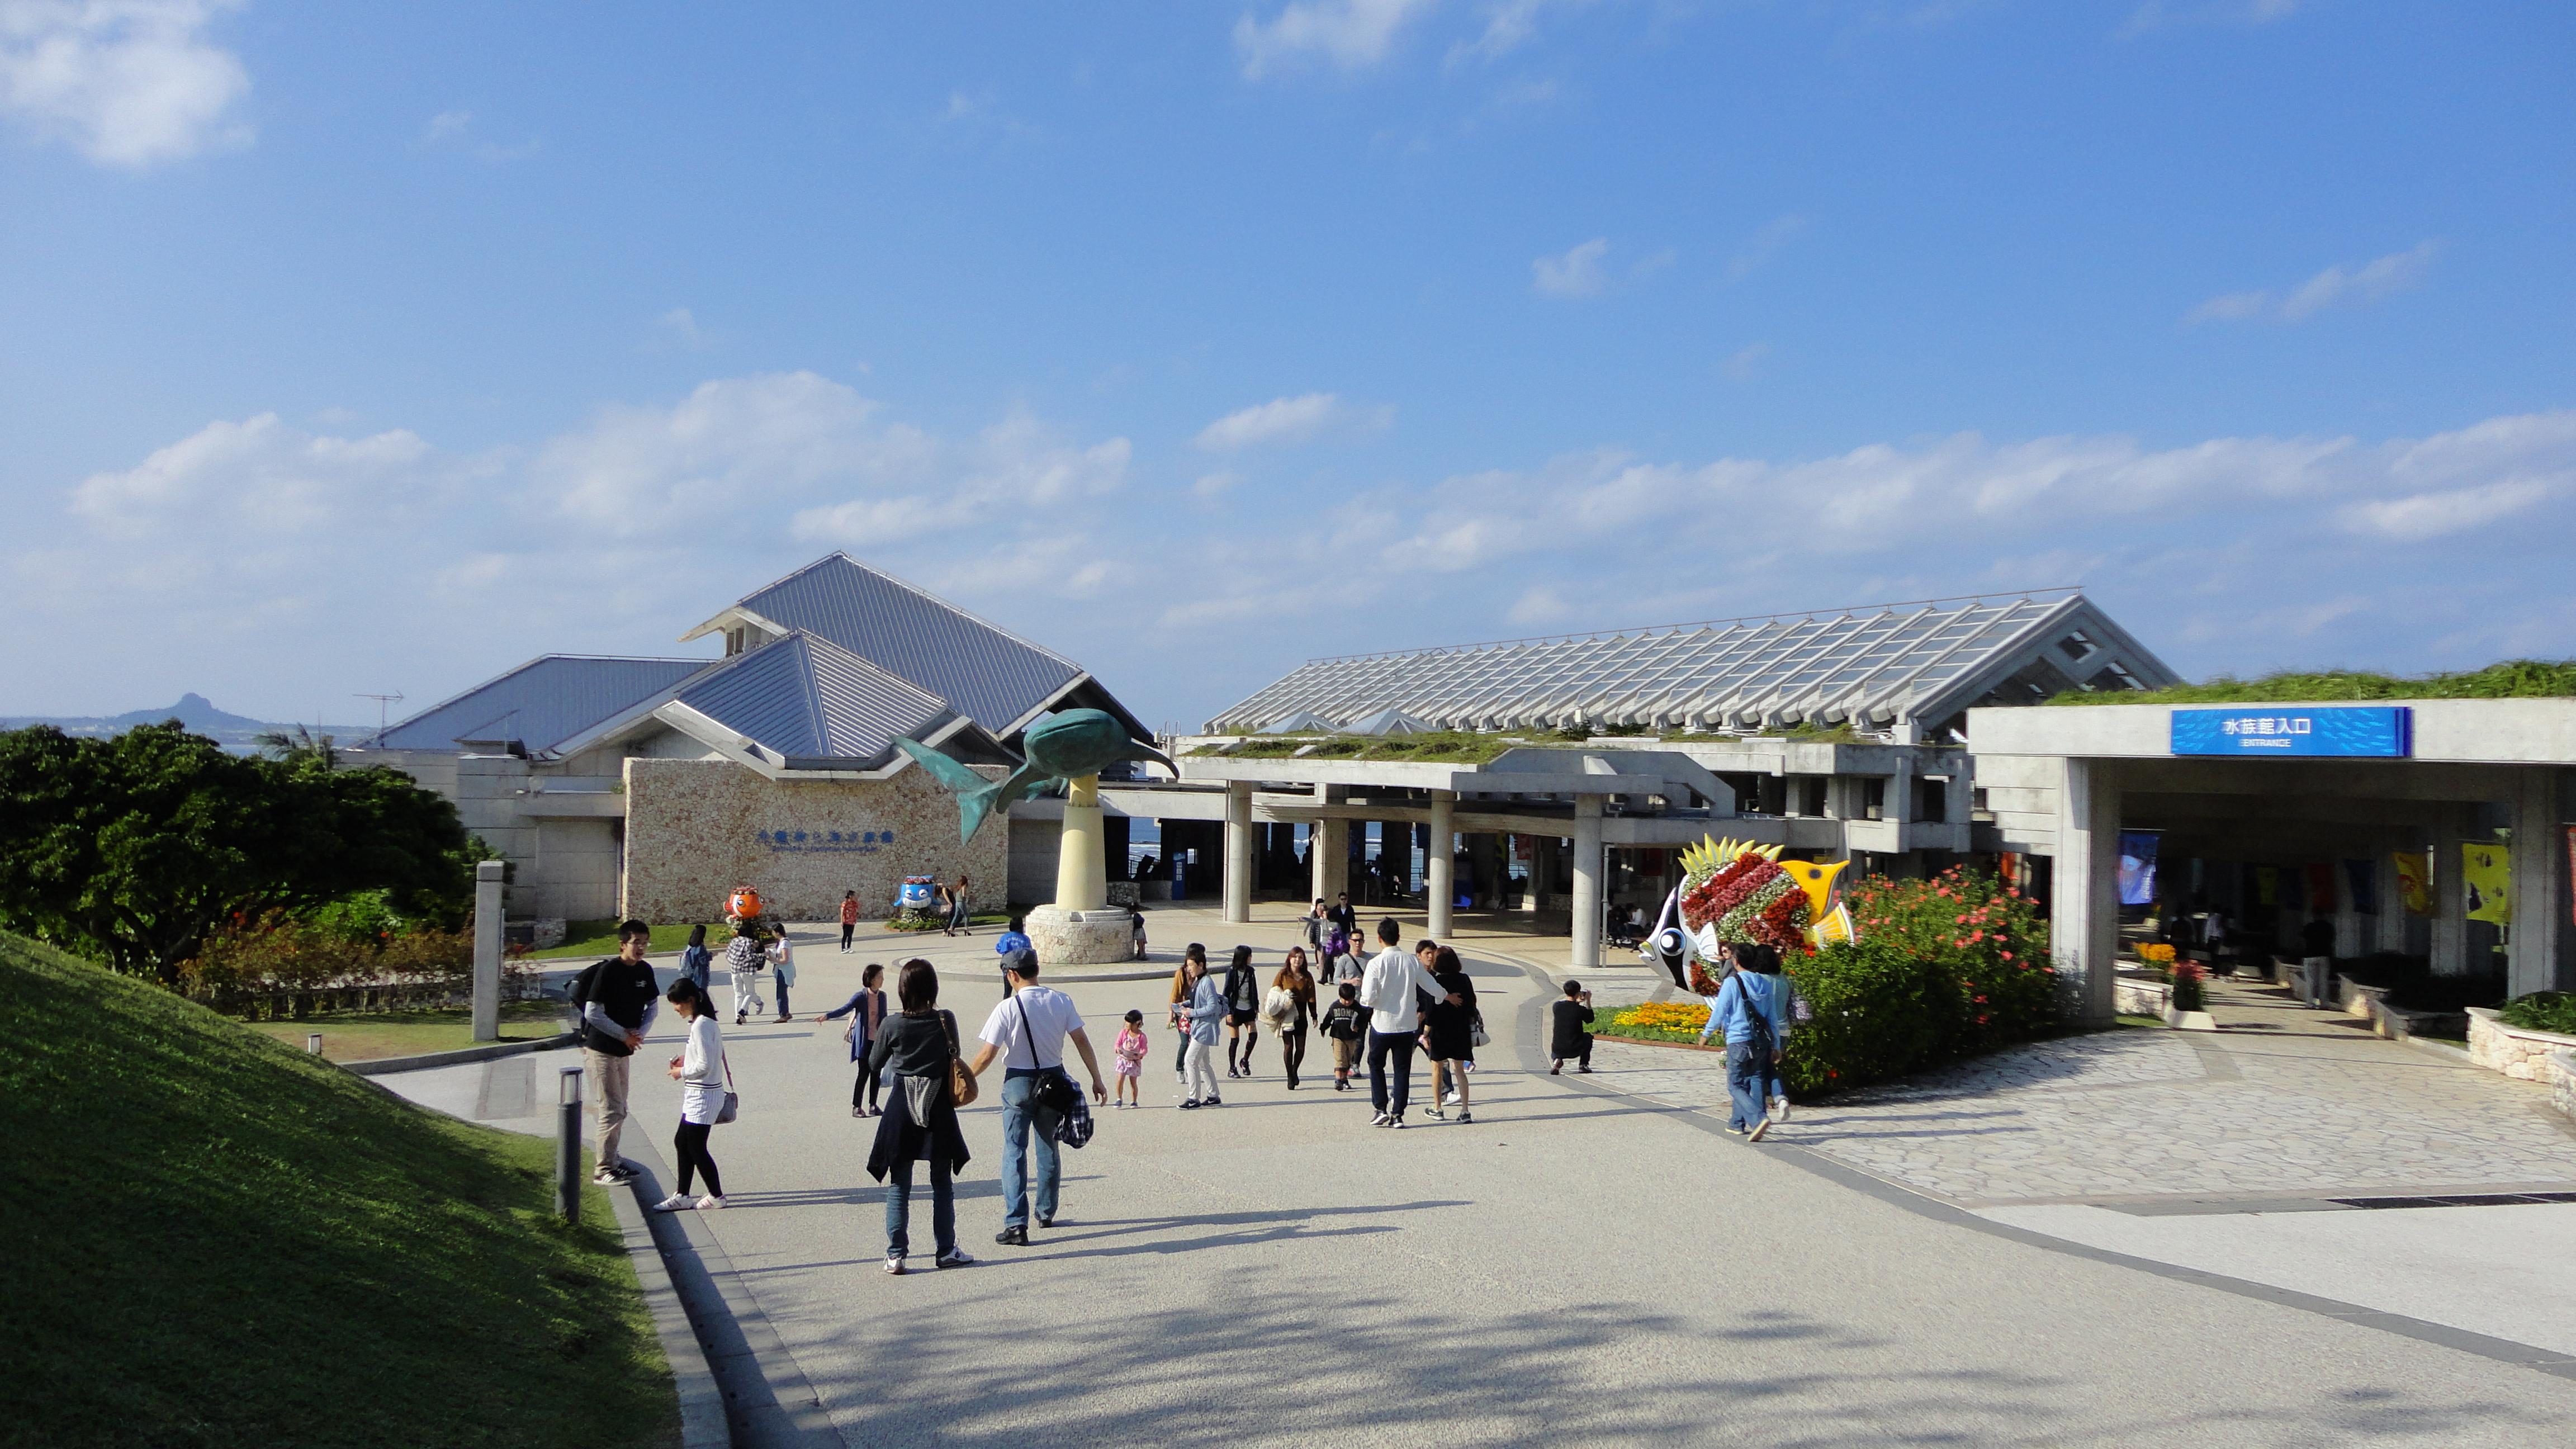 Okinawa Charaumi Aquarium